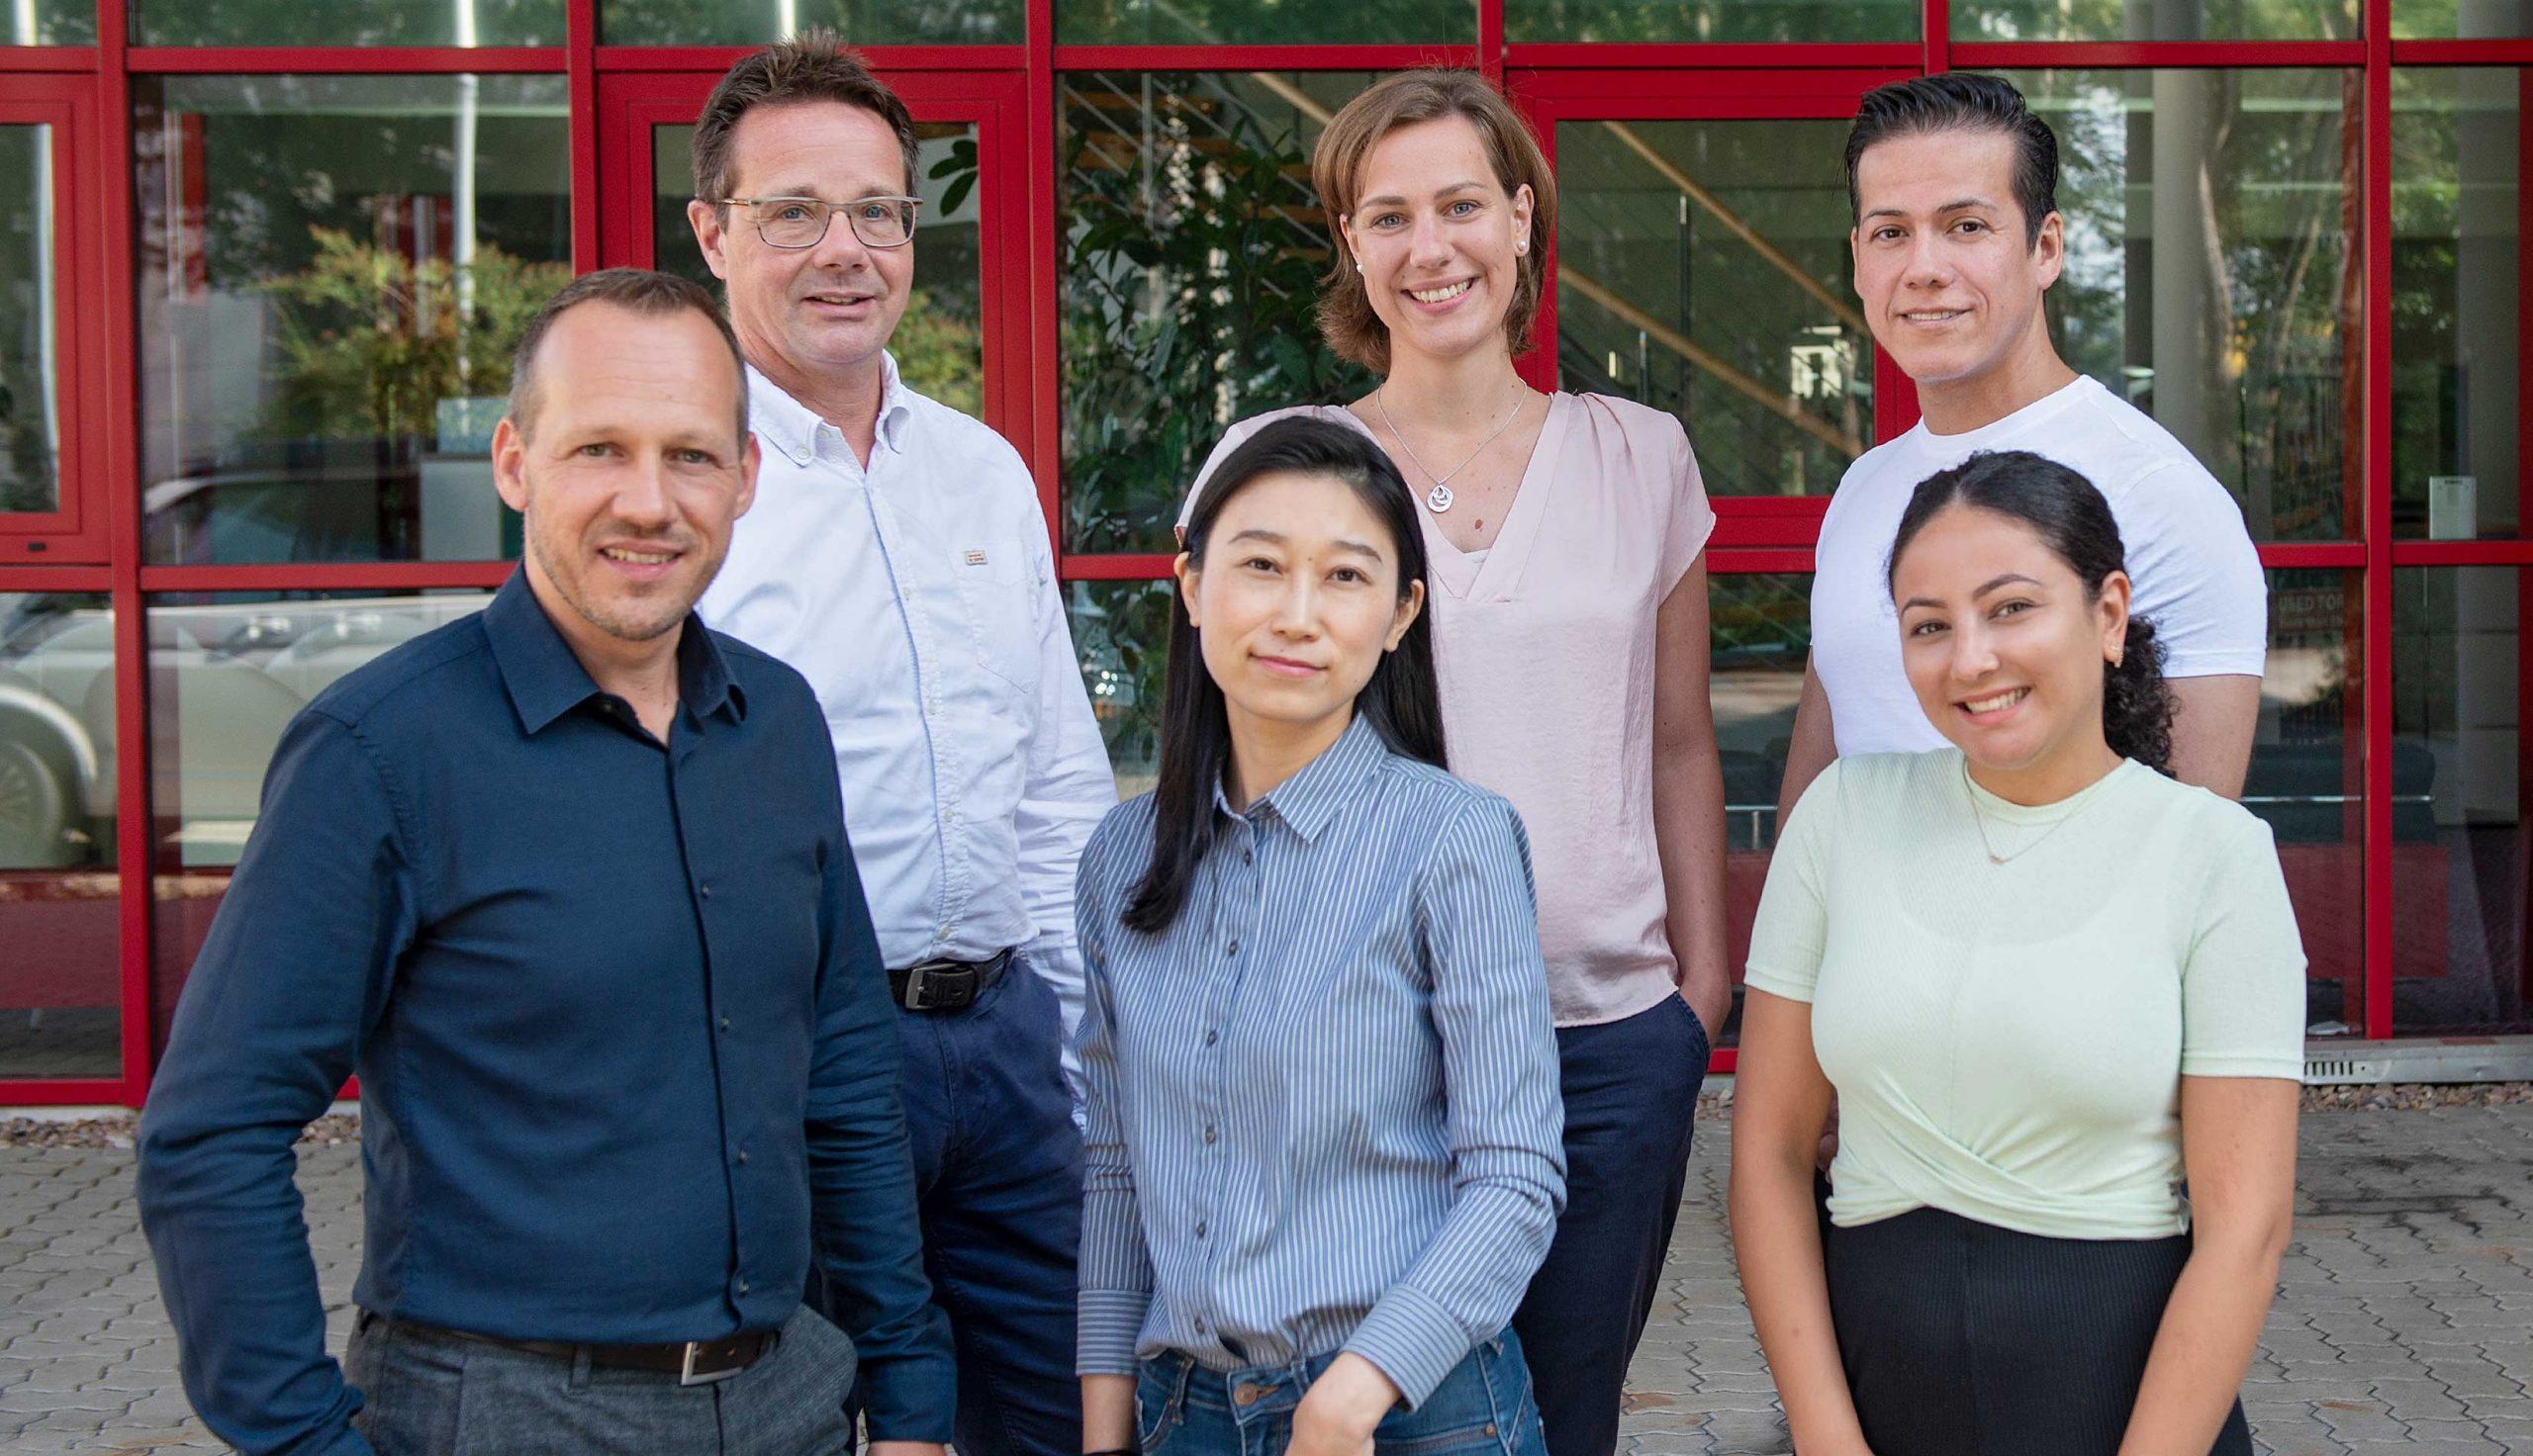 TRAFIK Bremen - Reliability, Quality and Professionalism